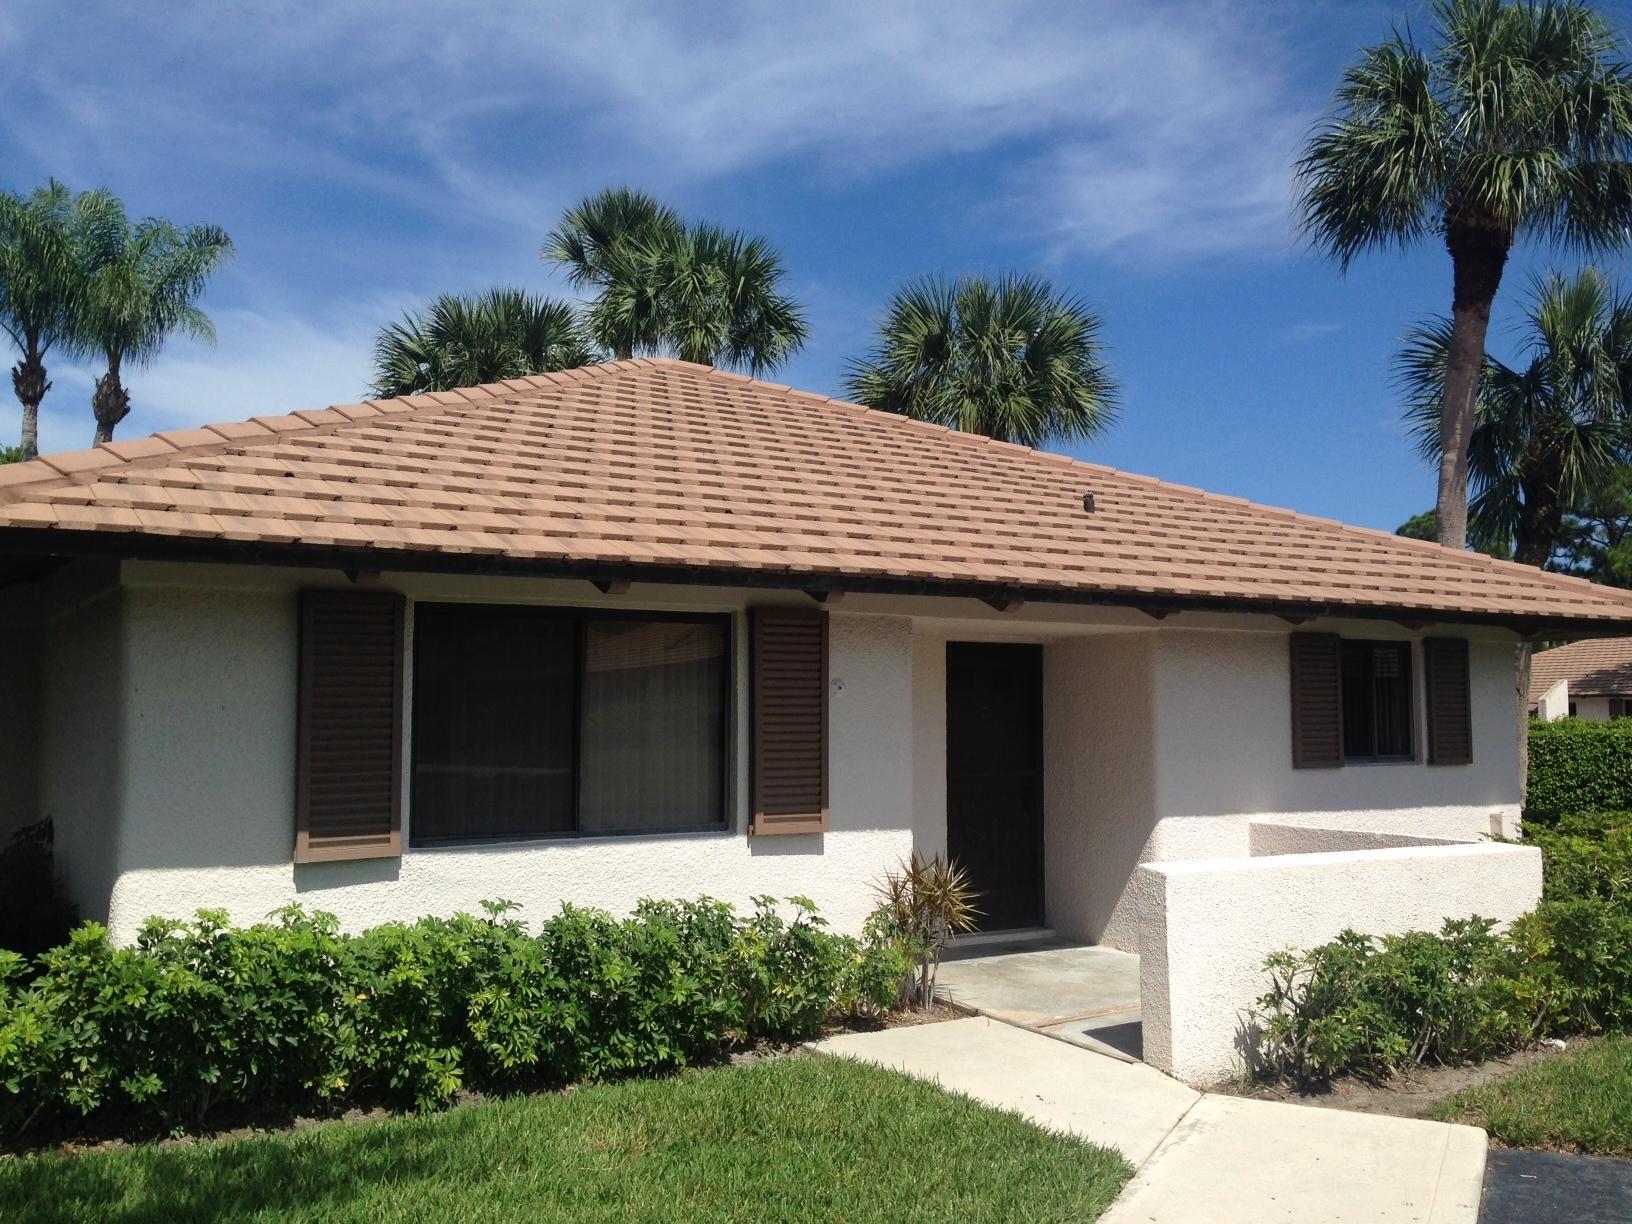 835 Club Drive, Palm Beach Gardens, Florida 33418, 2 Bedrooms Bedrooms, ,2 BathroomsBathrooms,F,Villa,Club,RX-10575076